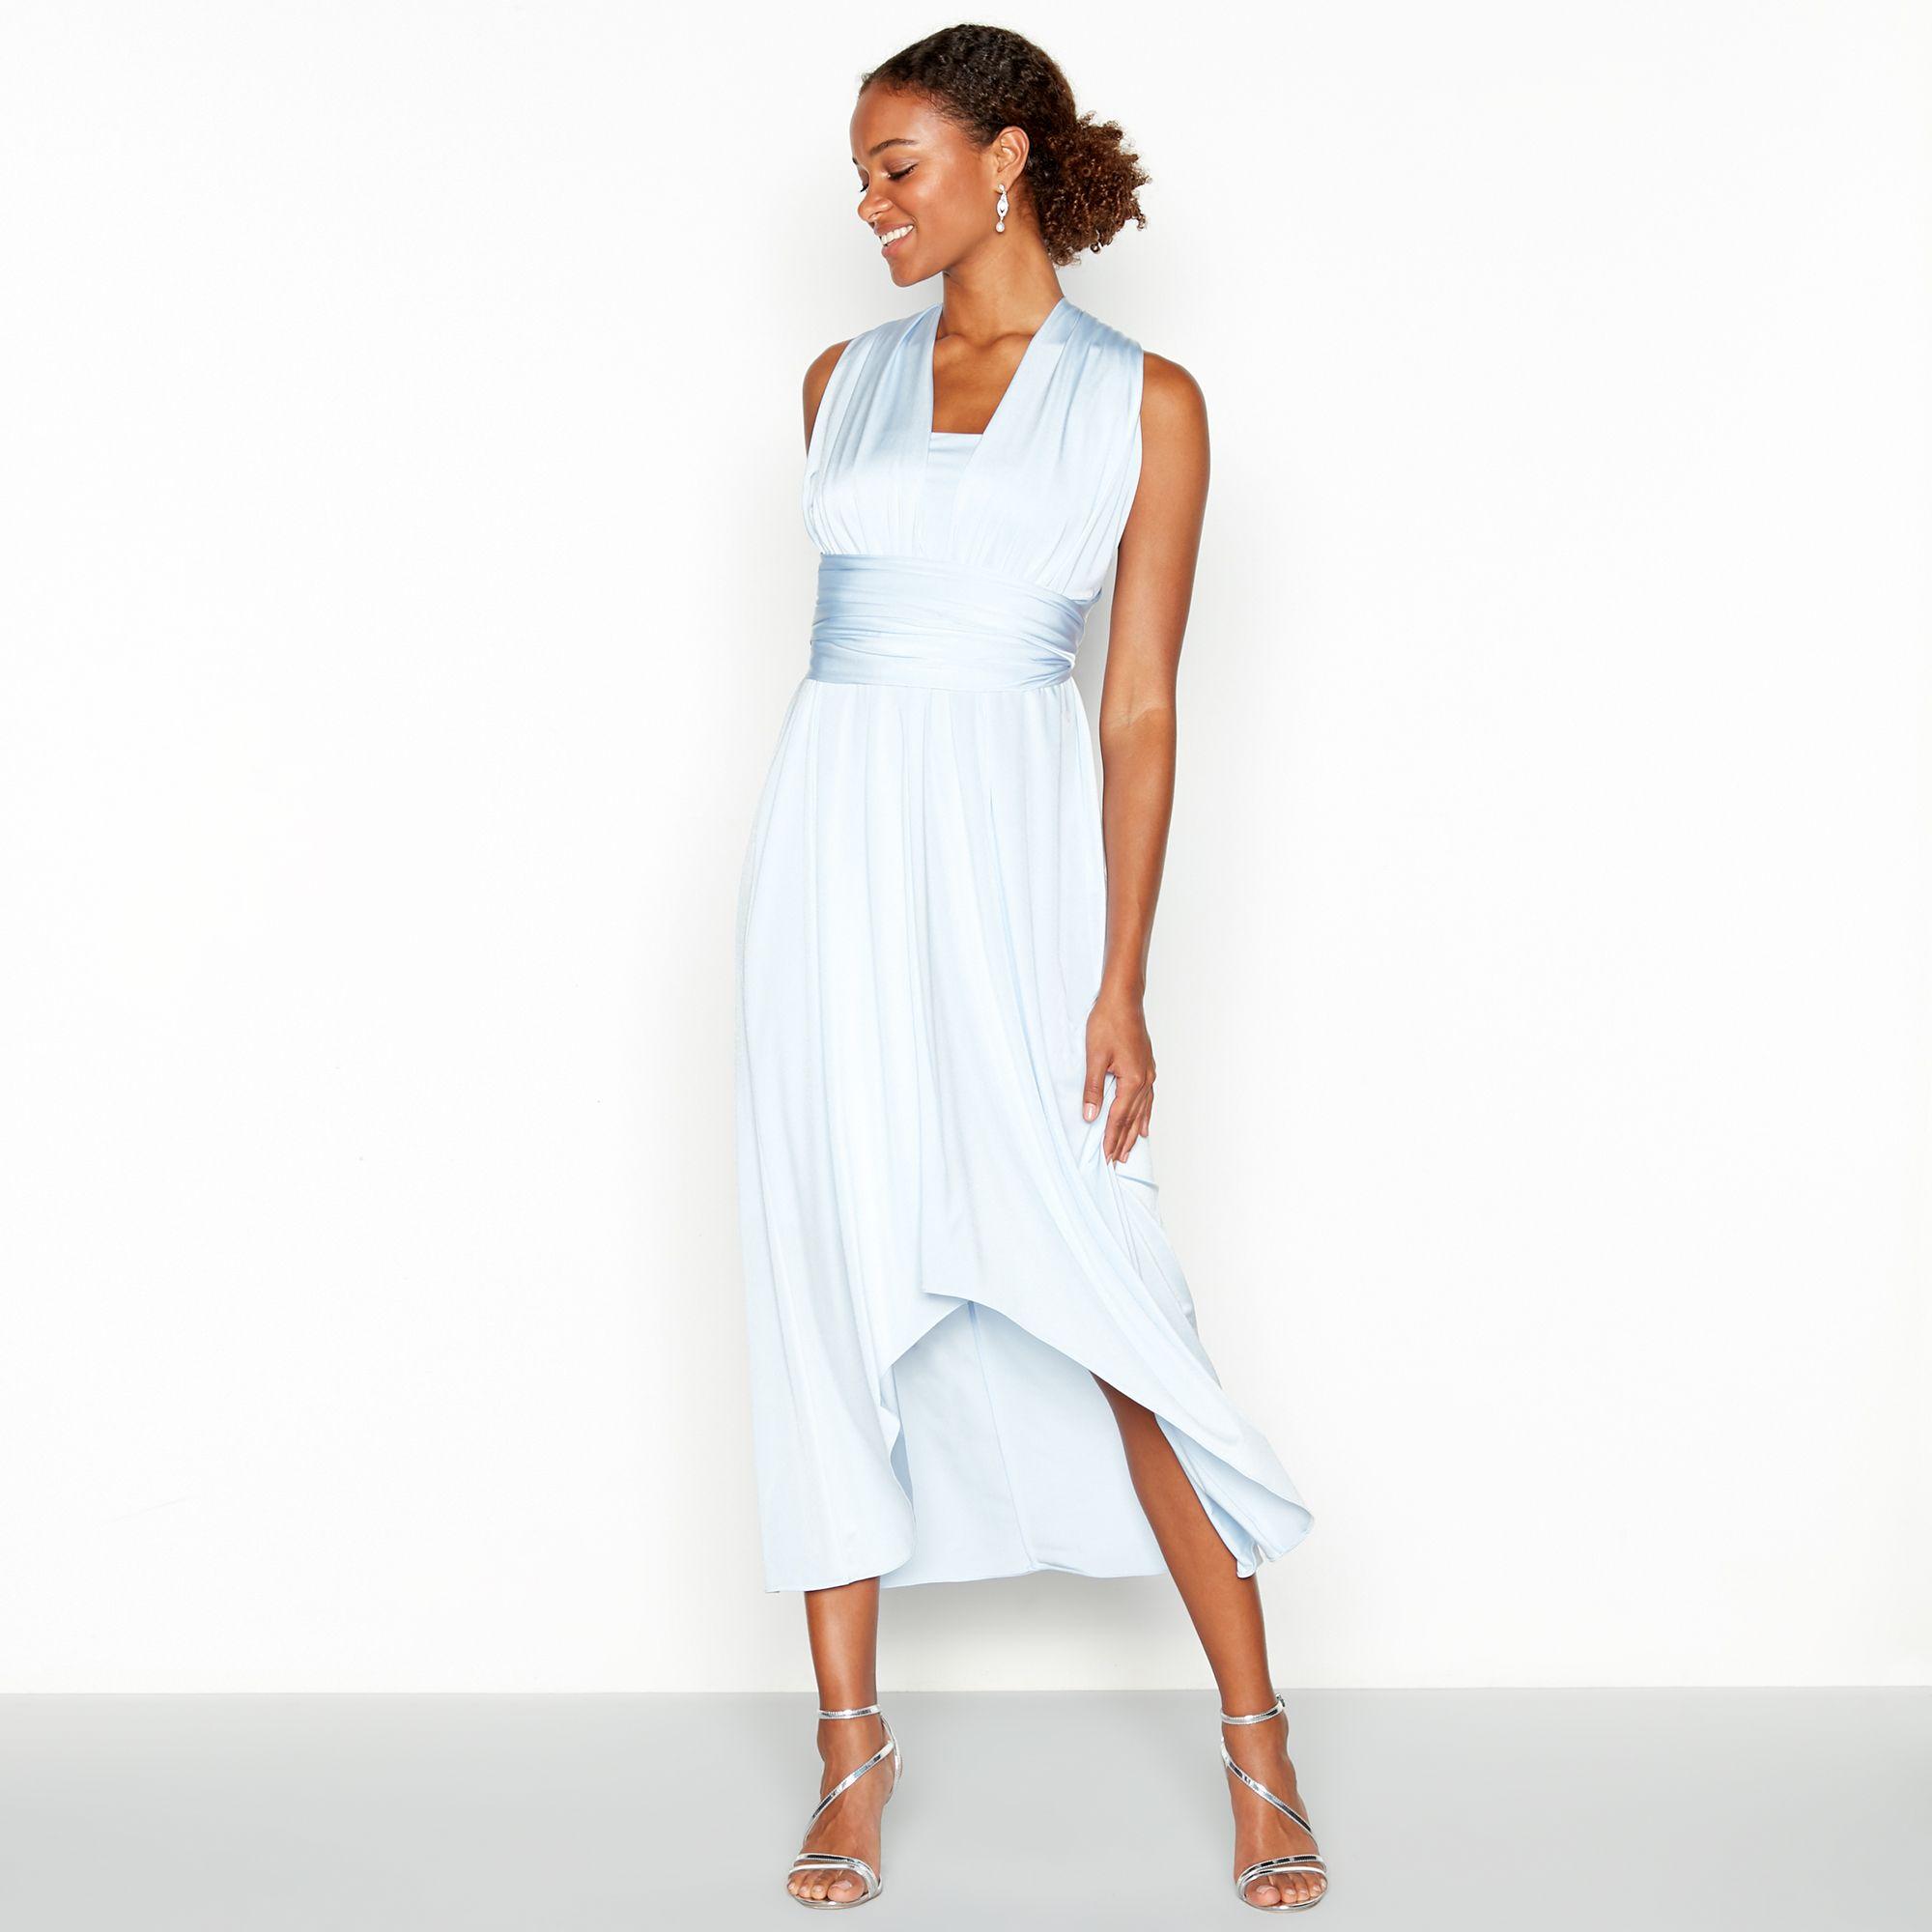 7ddc9b21444 Multiway Bridesmaid Dresses Uk High Street - Data Dynamic AG